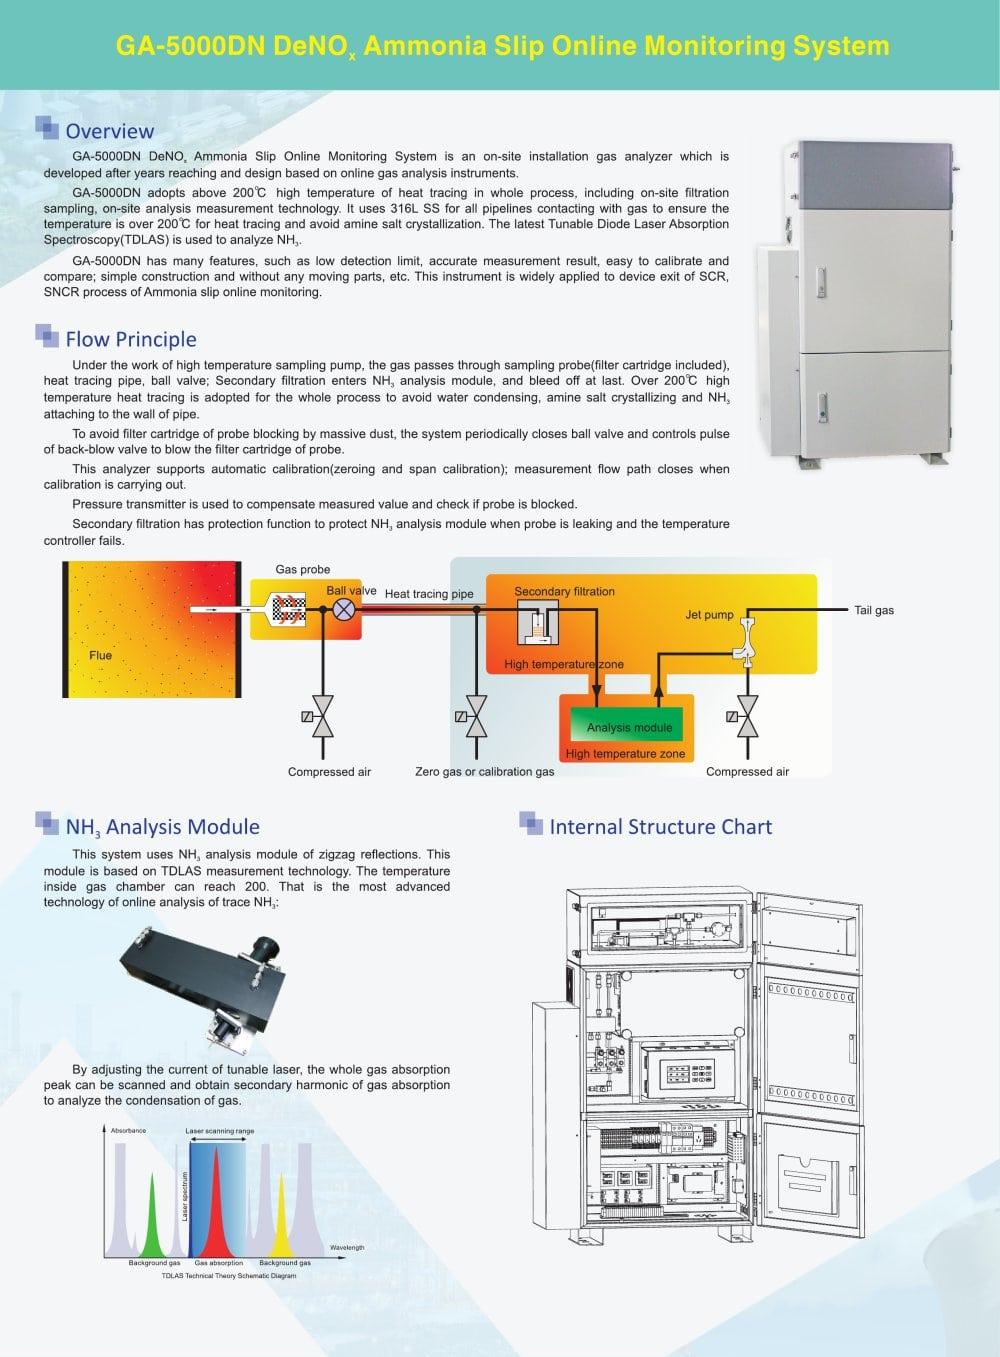 hight resolution of zetian online monitoring system tdlas ammonia slip nh3 industrial process ga 5000dn iron making steel making coking refining petrochemical flue gas